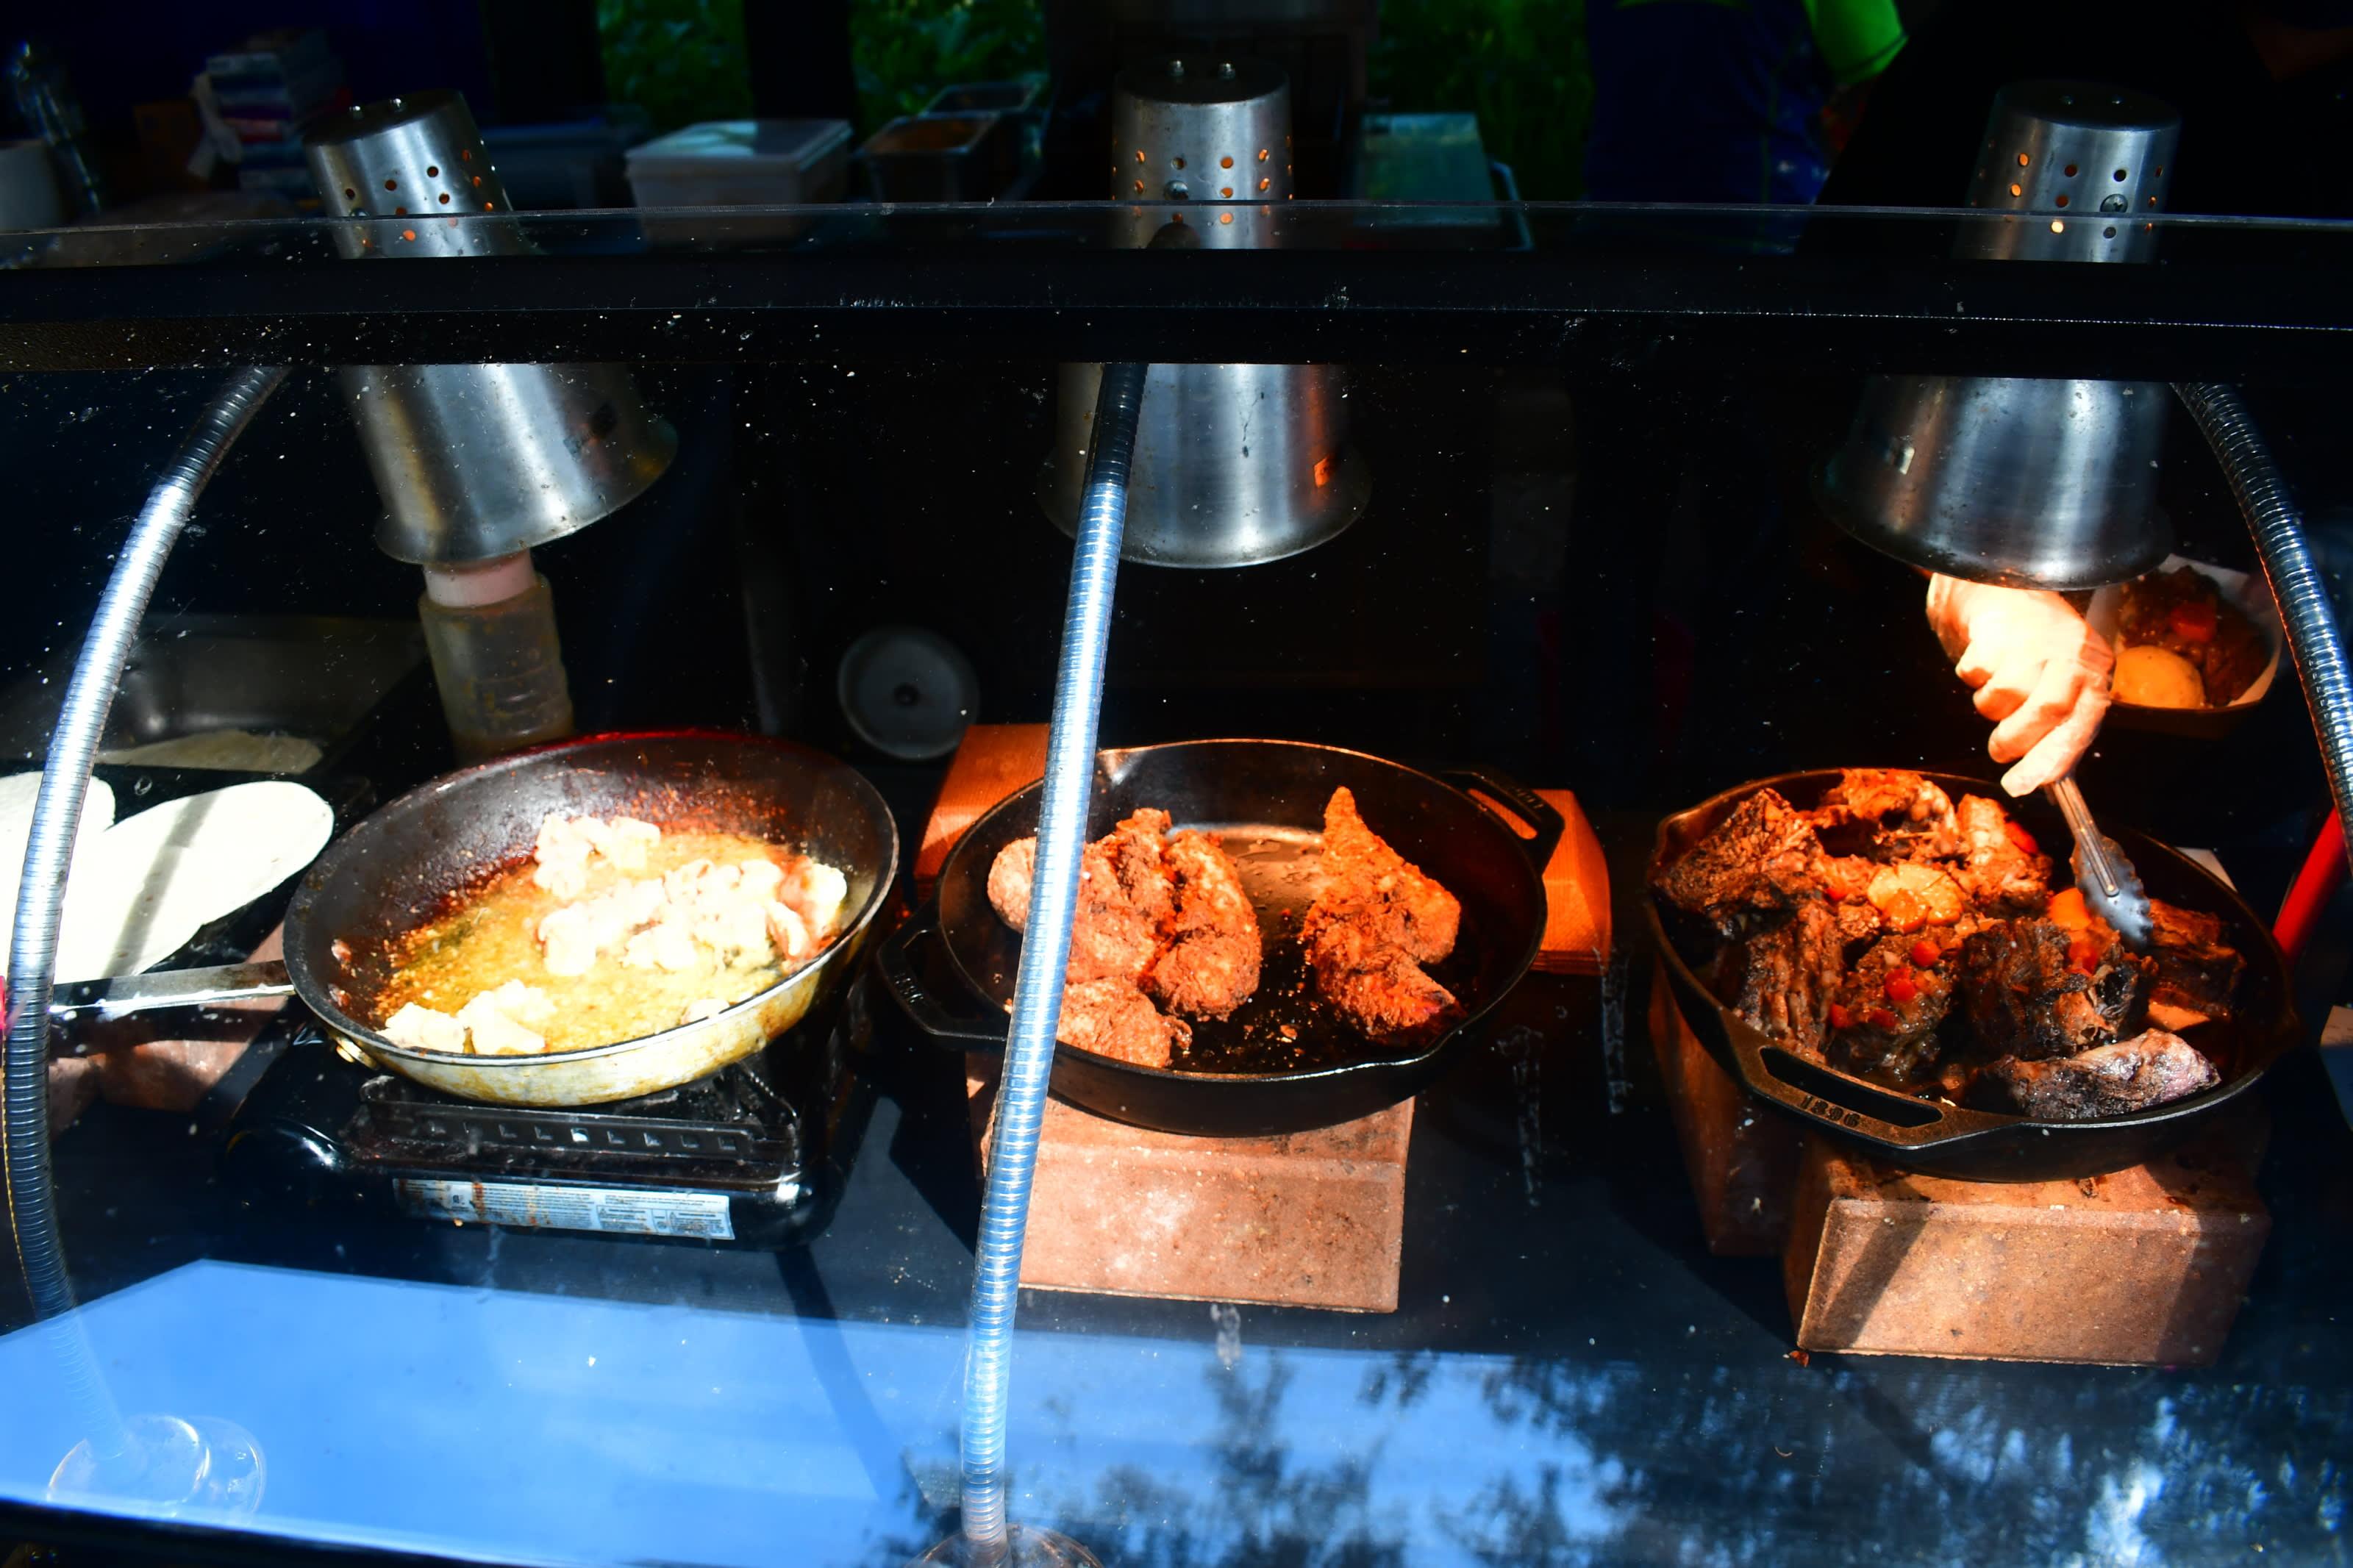 SeaWorld food kiosk